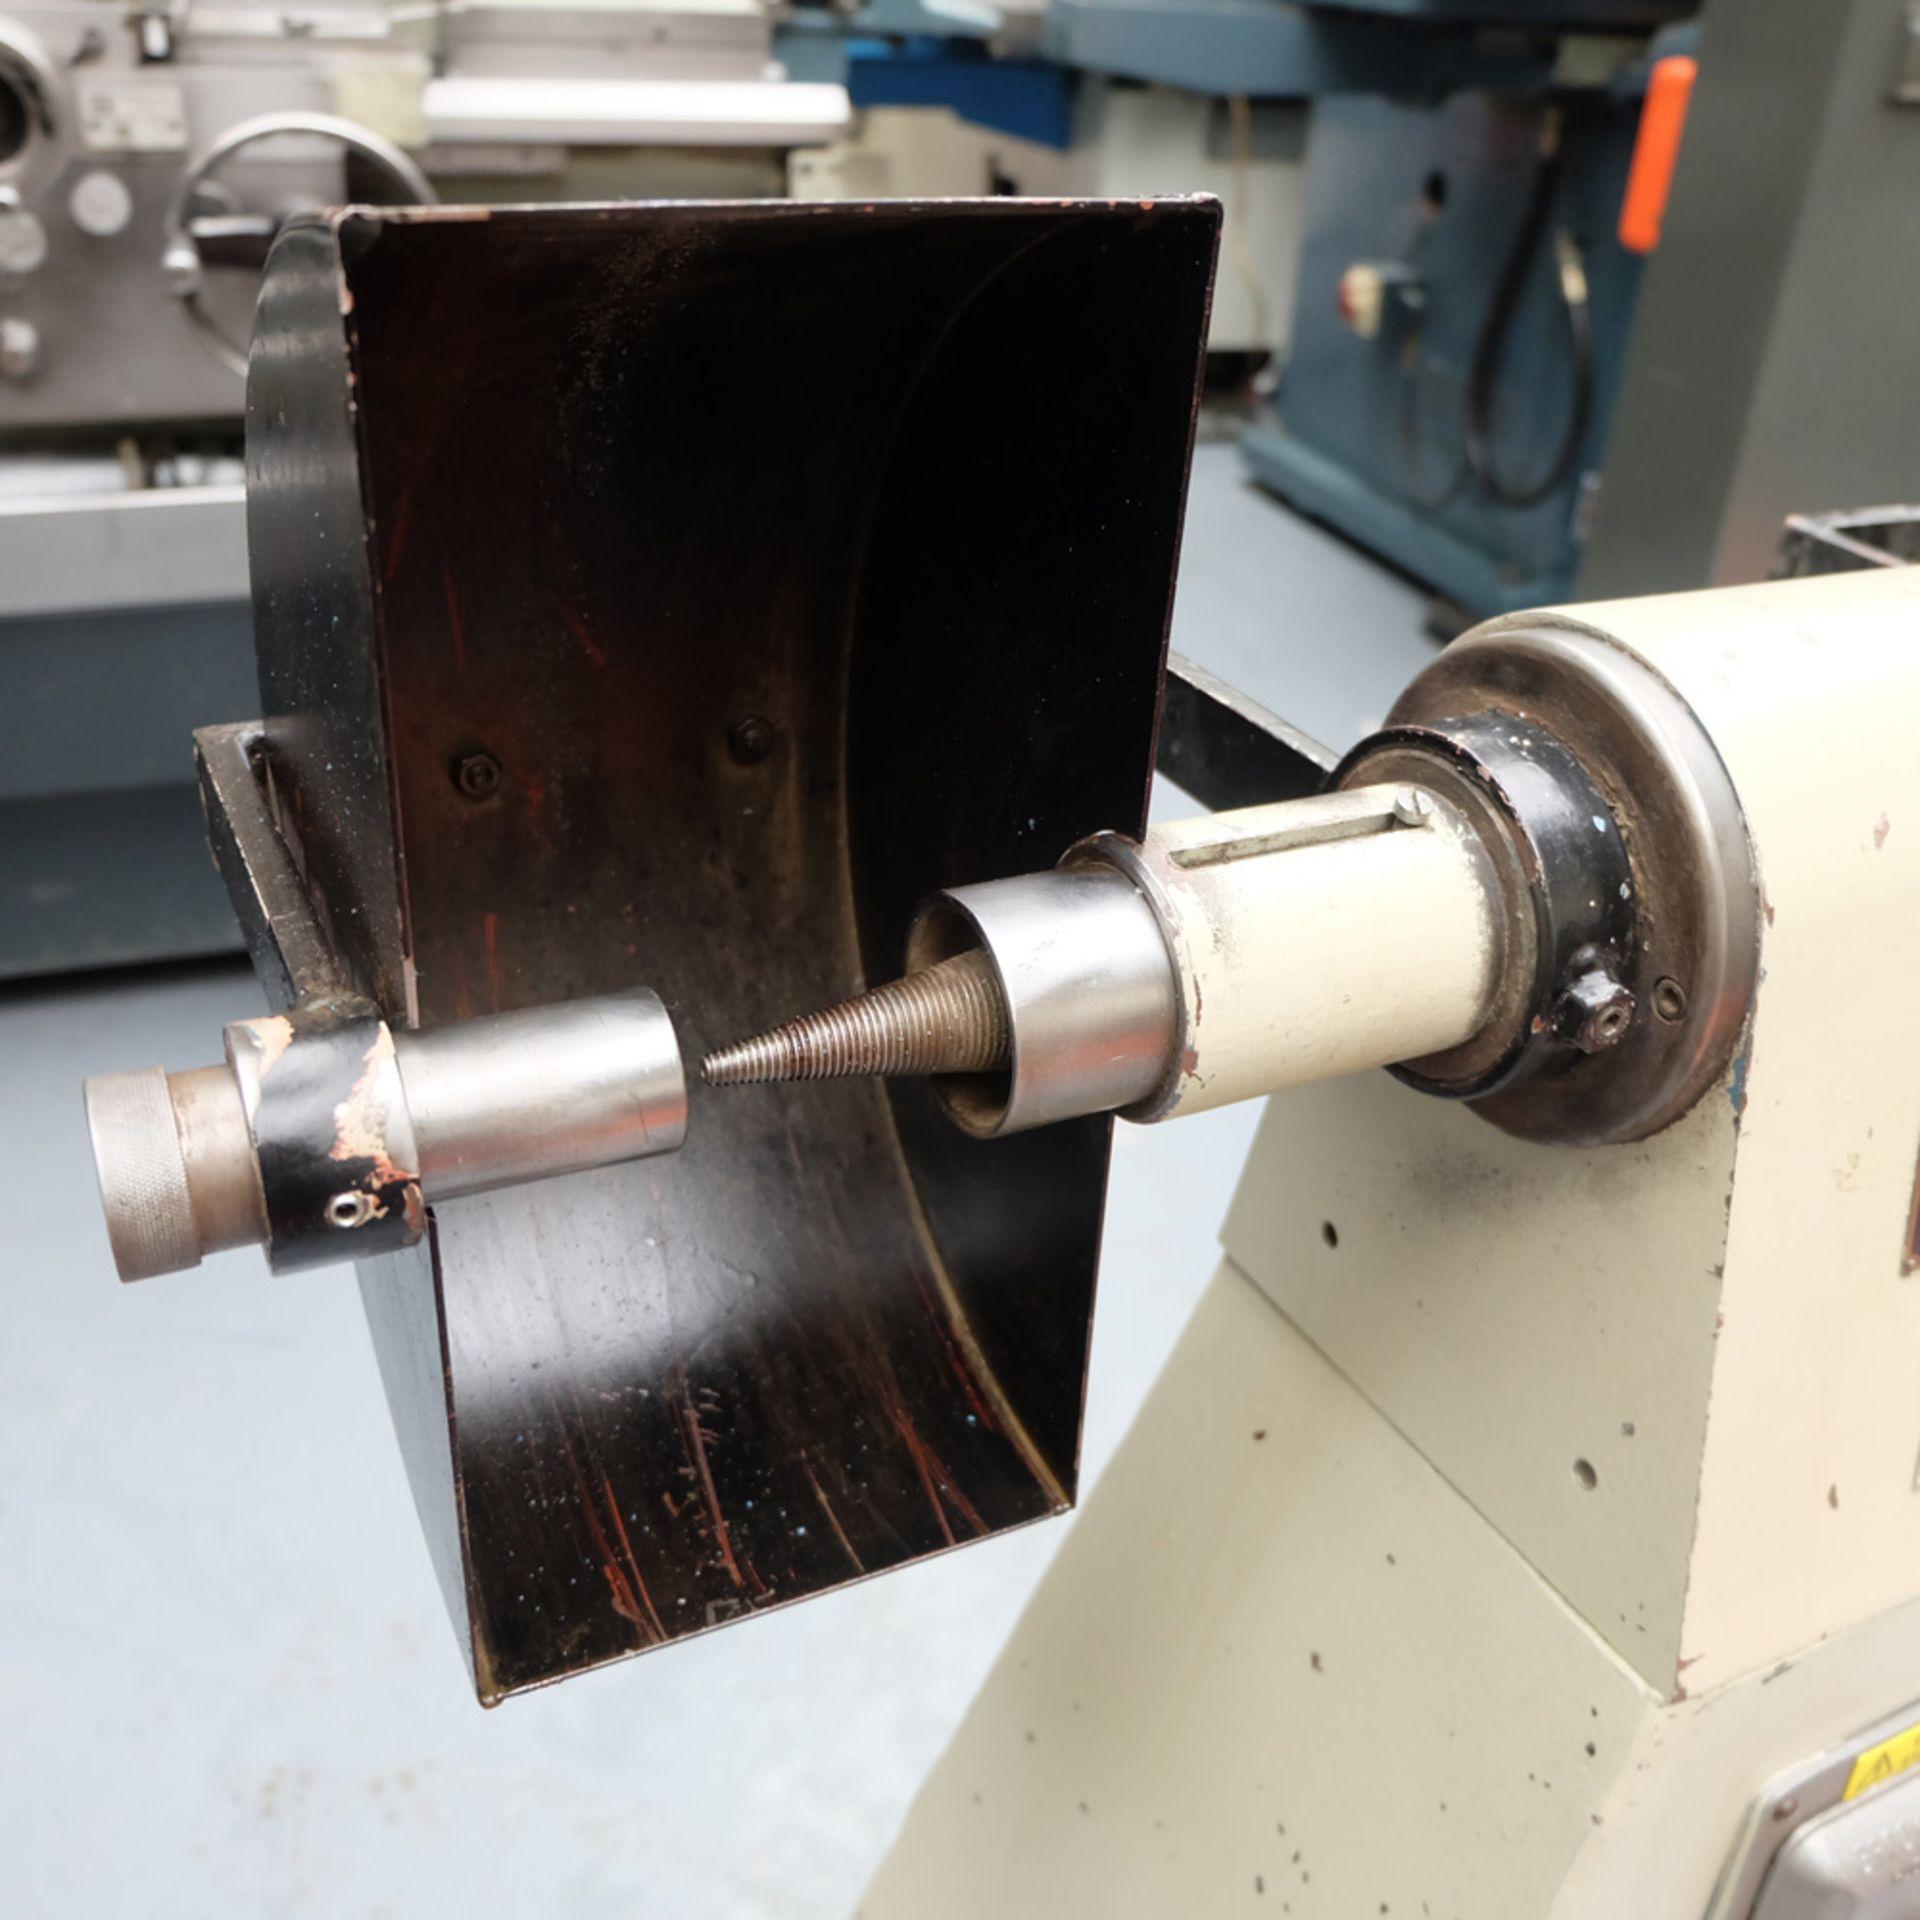 Viceroy Model TDS9 Double Ended Pedestal Polishing Machine. - Image 4 of 6